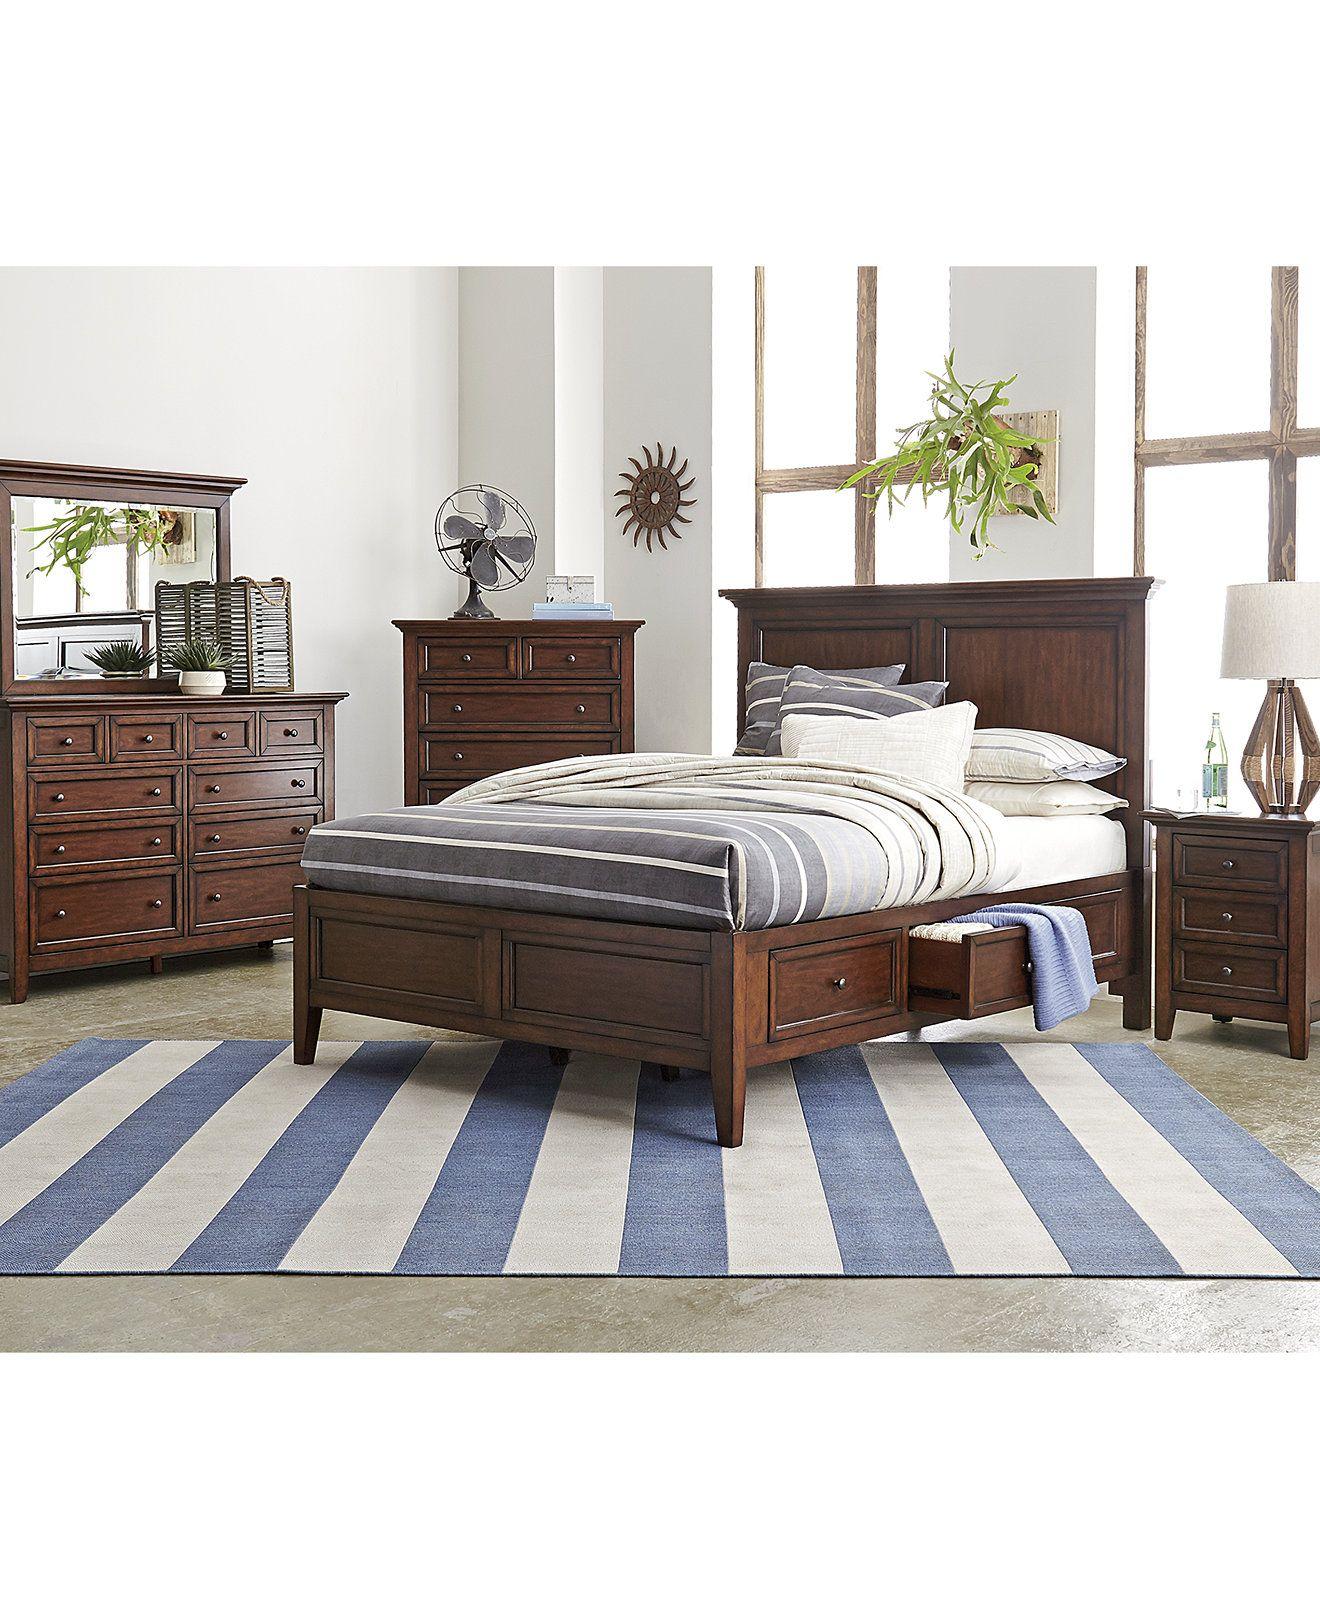 Furniture Matteo Storage Platform Bedroom Furniture Collection